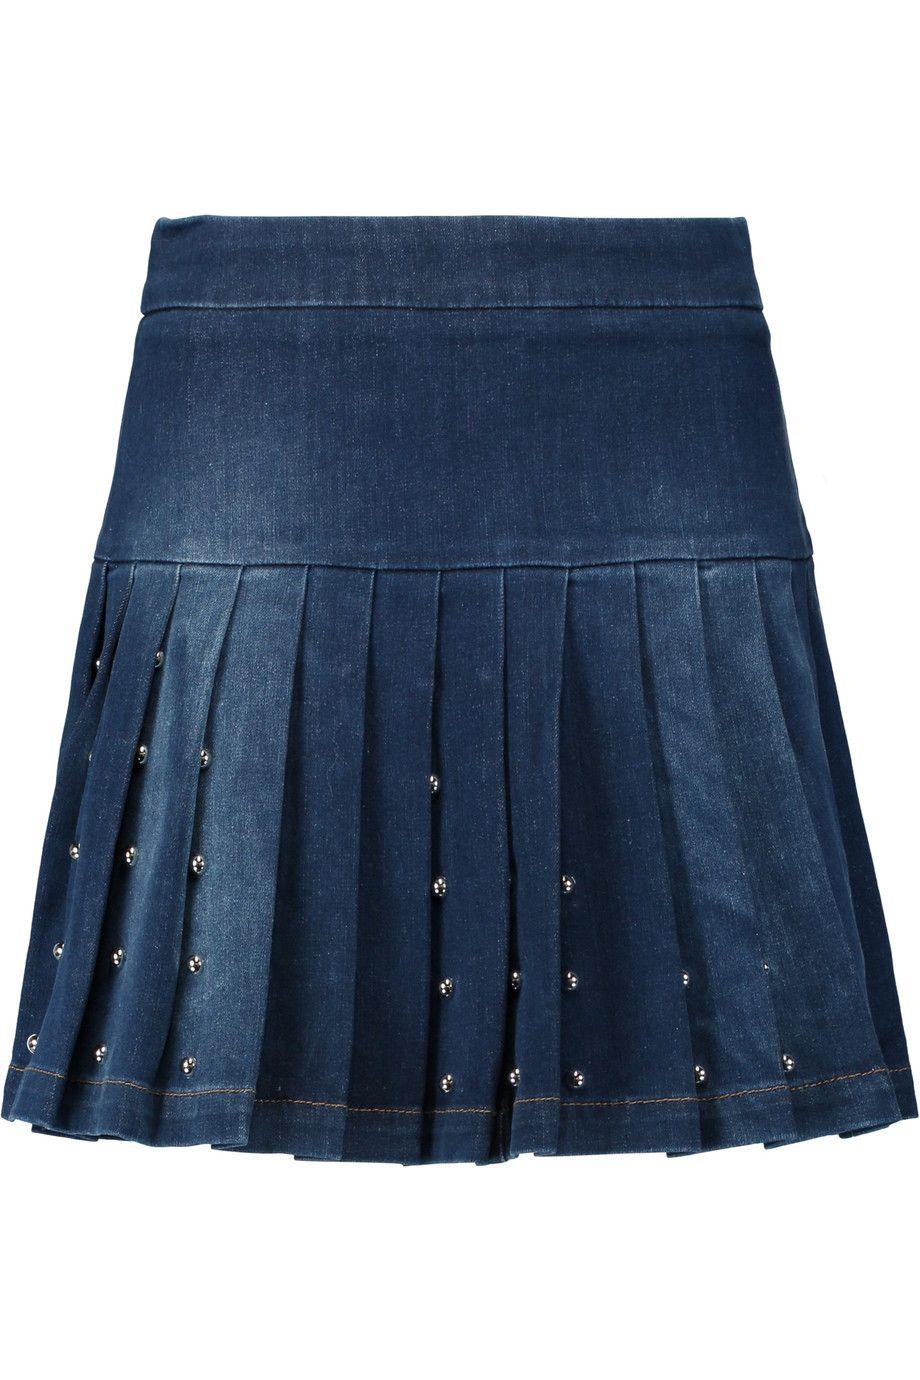 c4060a03f MCQ BY ALEXANDER MCQUEEN Pleated studded stretch-denim mini skirt.  #mcqbyalexandermcqueen #cloth #skirt